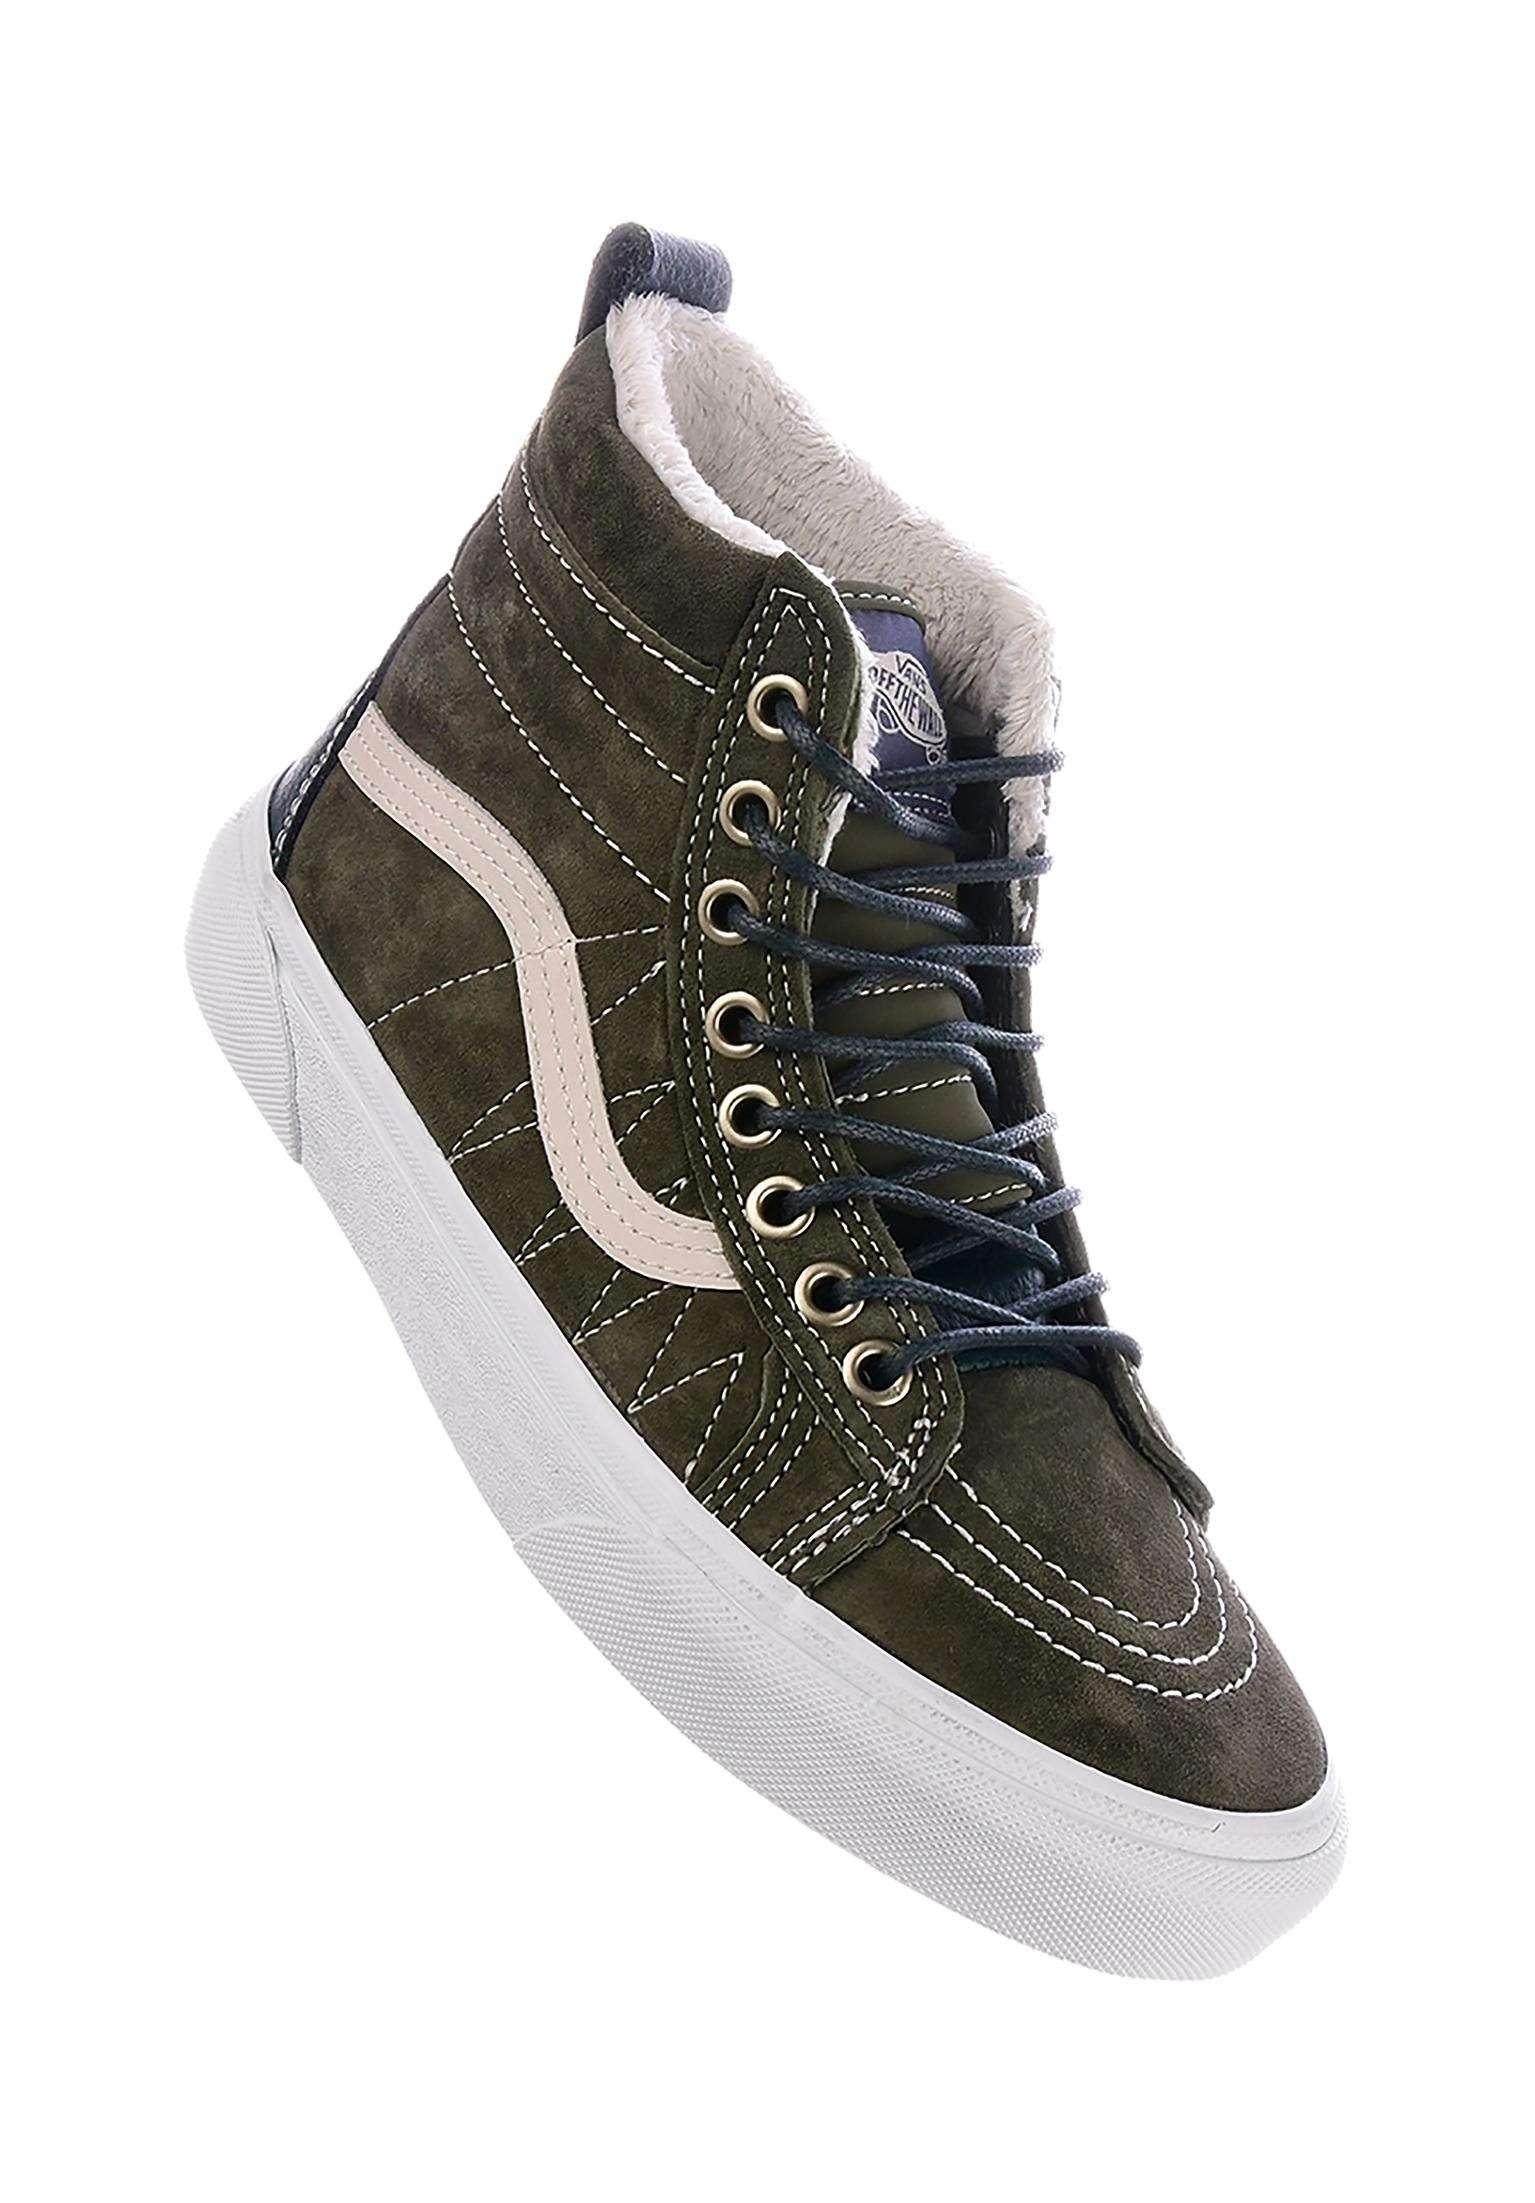 Secure Shopping Herren Vans Sk8 Hi MTE Schuhe beige oliv Hi